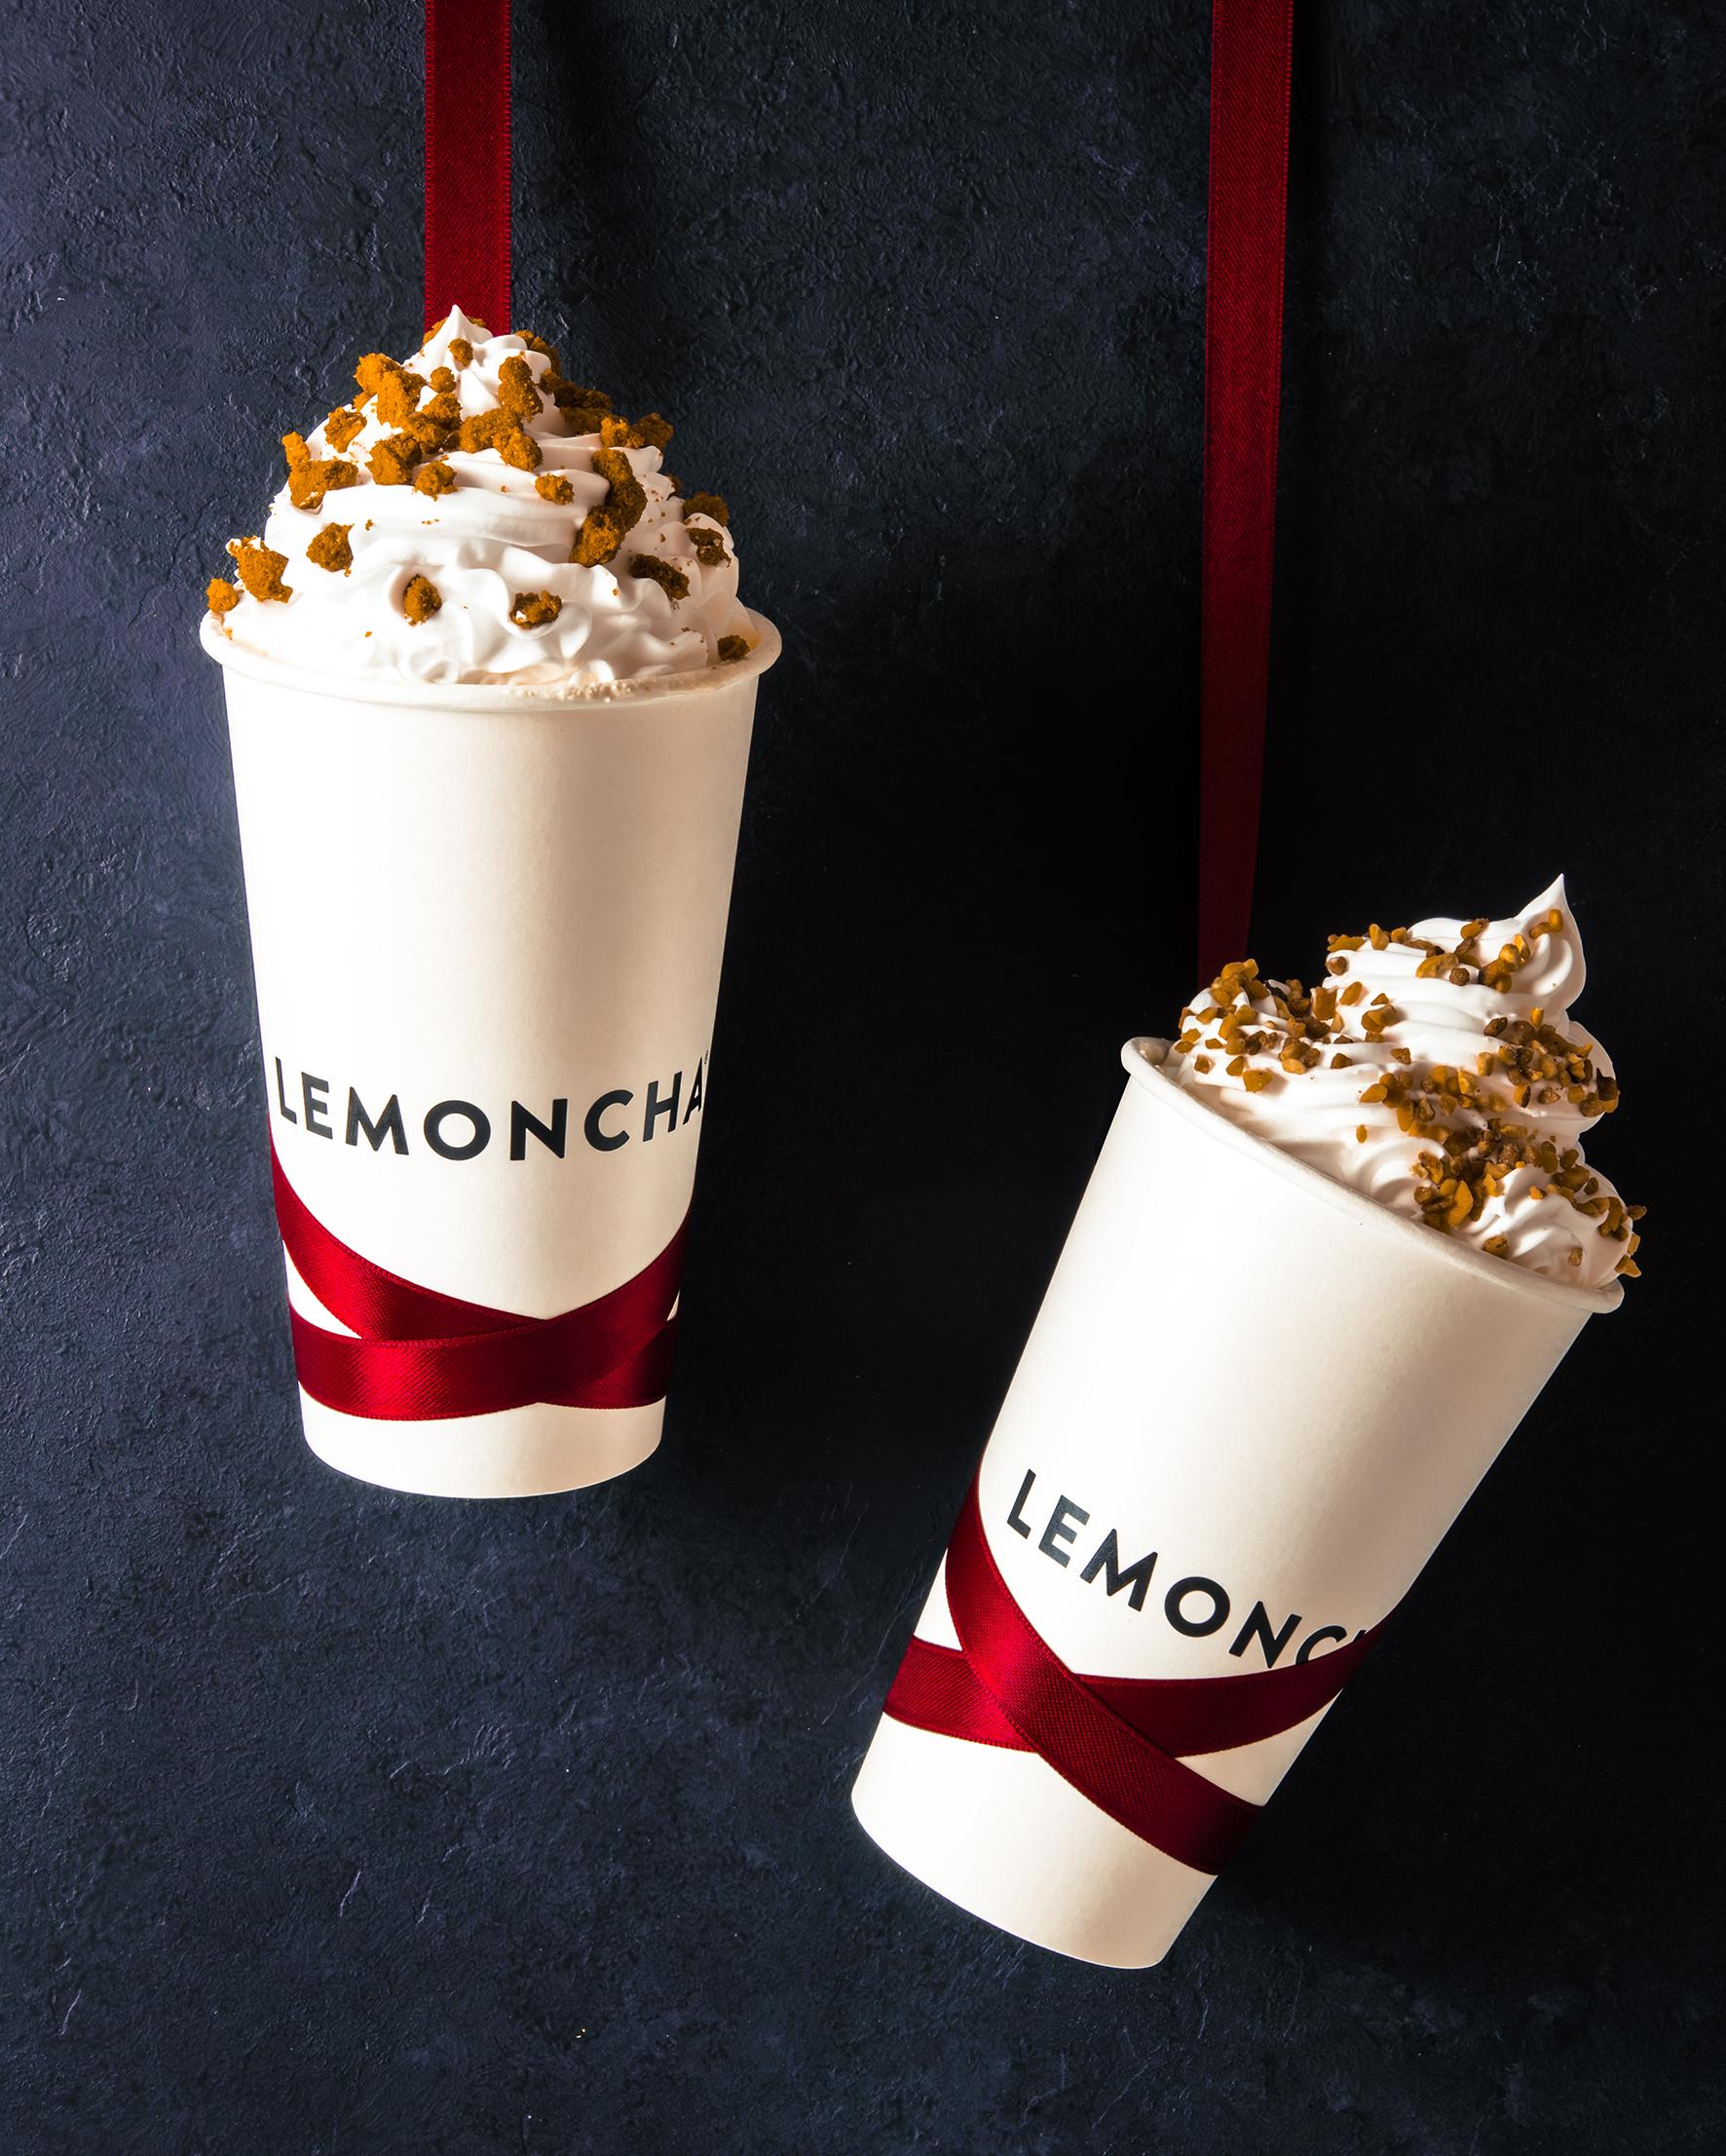 Lemoncha Limited Winter Drinks 2018